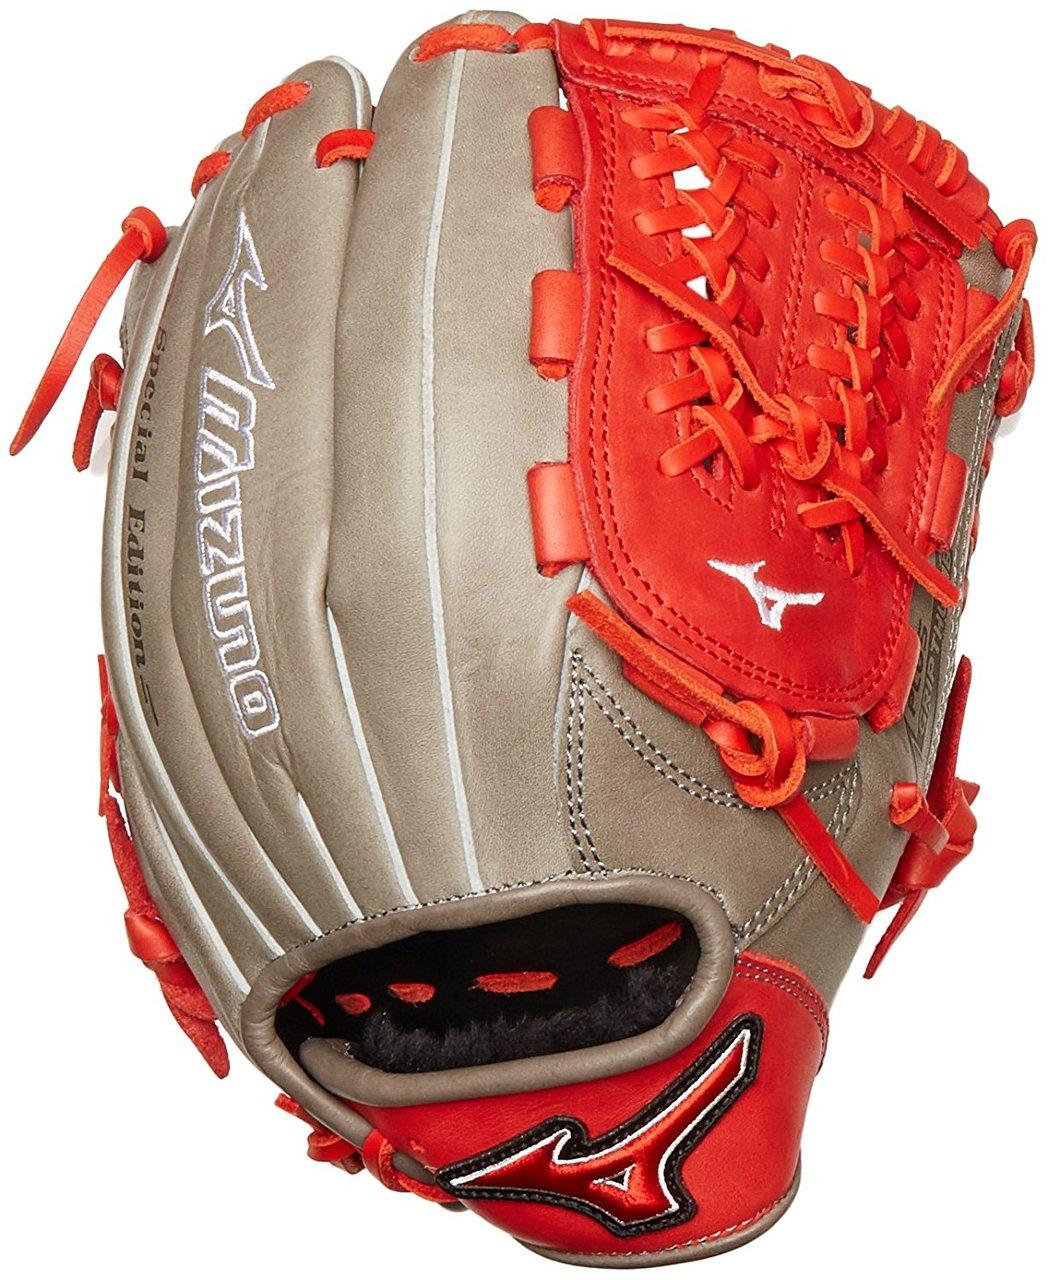 mizuno-gmvp1177se4-mvp-prime-se-baseball-glove-11-75-right-hand-throw GMVP1177PSE4-SMRD-RightHandThrow Mizuno 041969557495 Center pocket designed patterns pattern design that naturally centers the pocket